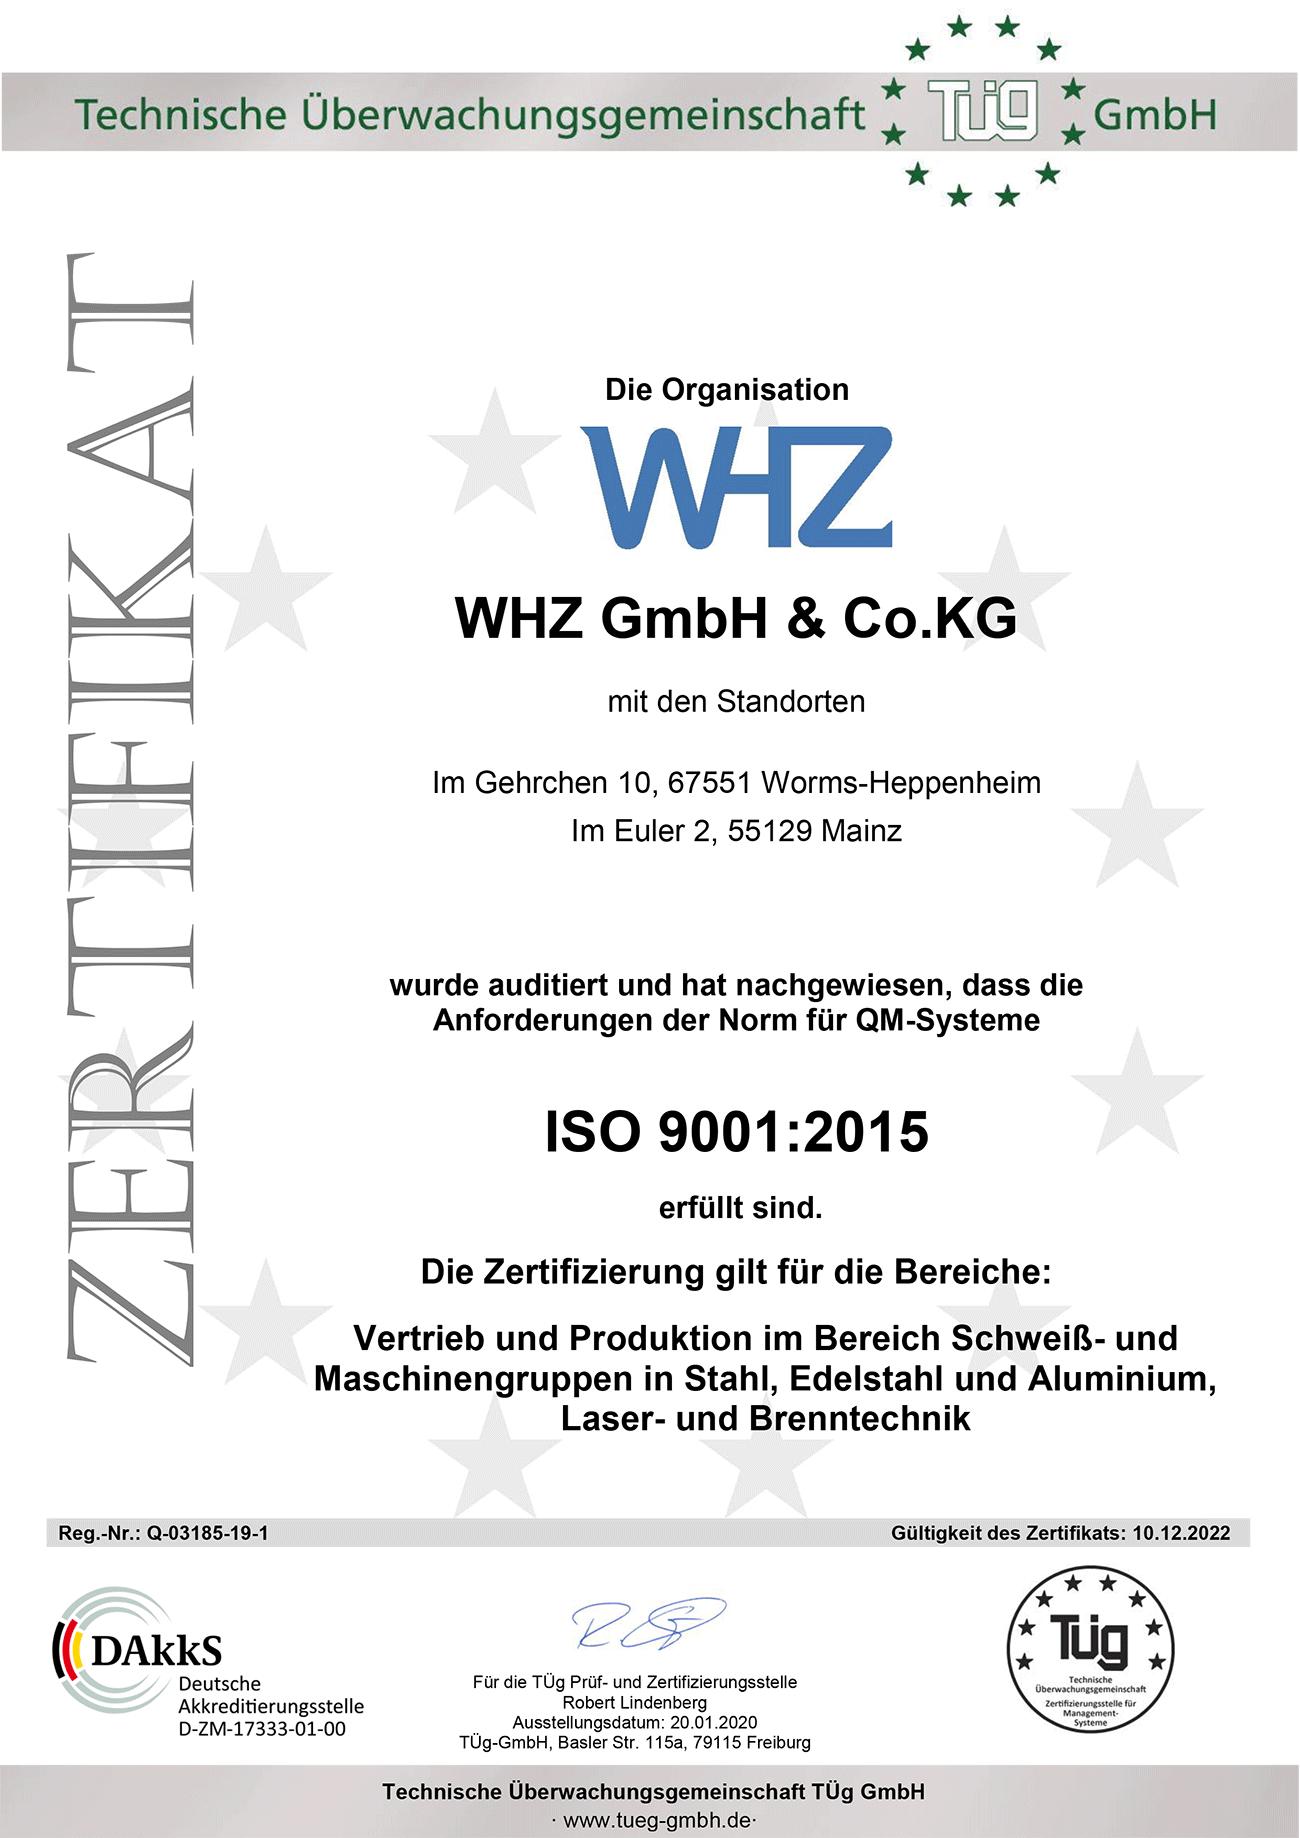 ZERTIFIKAT-03185-WHZ-GmbH-9001-2015-DE